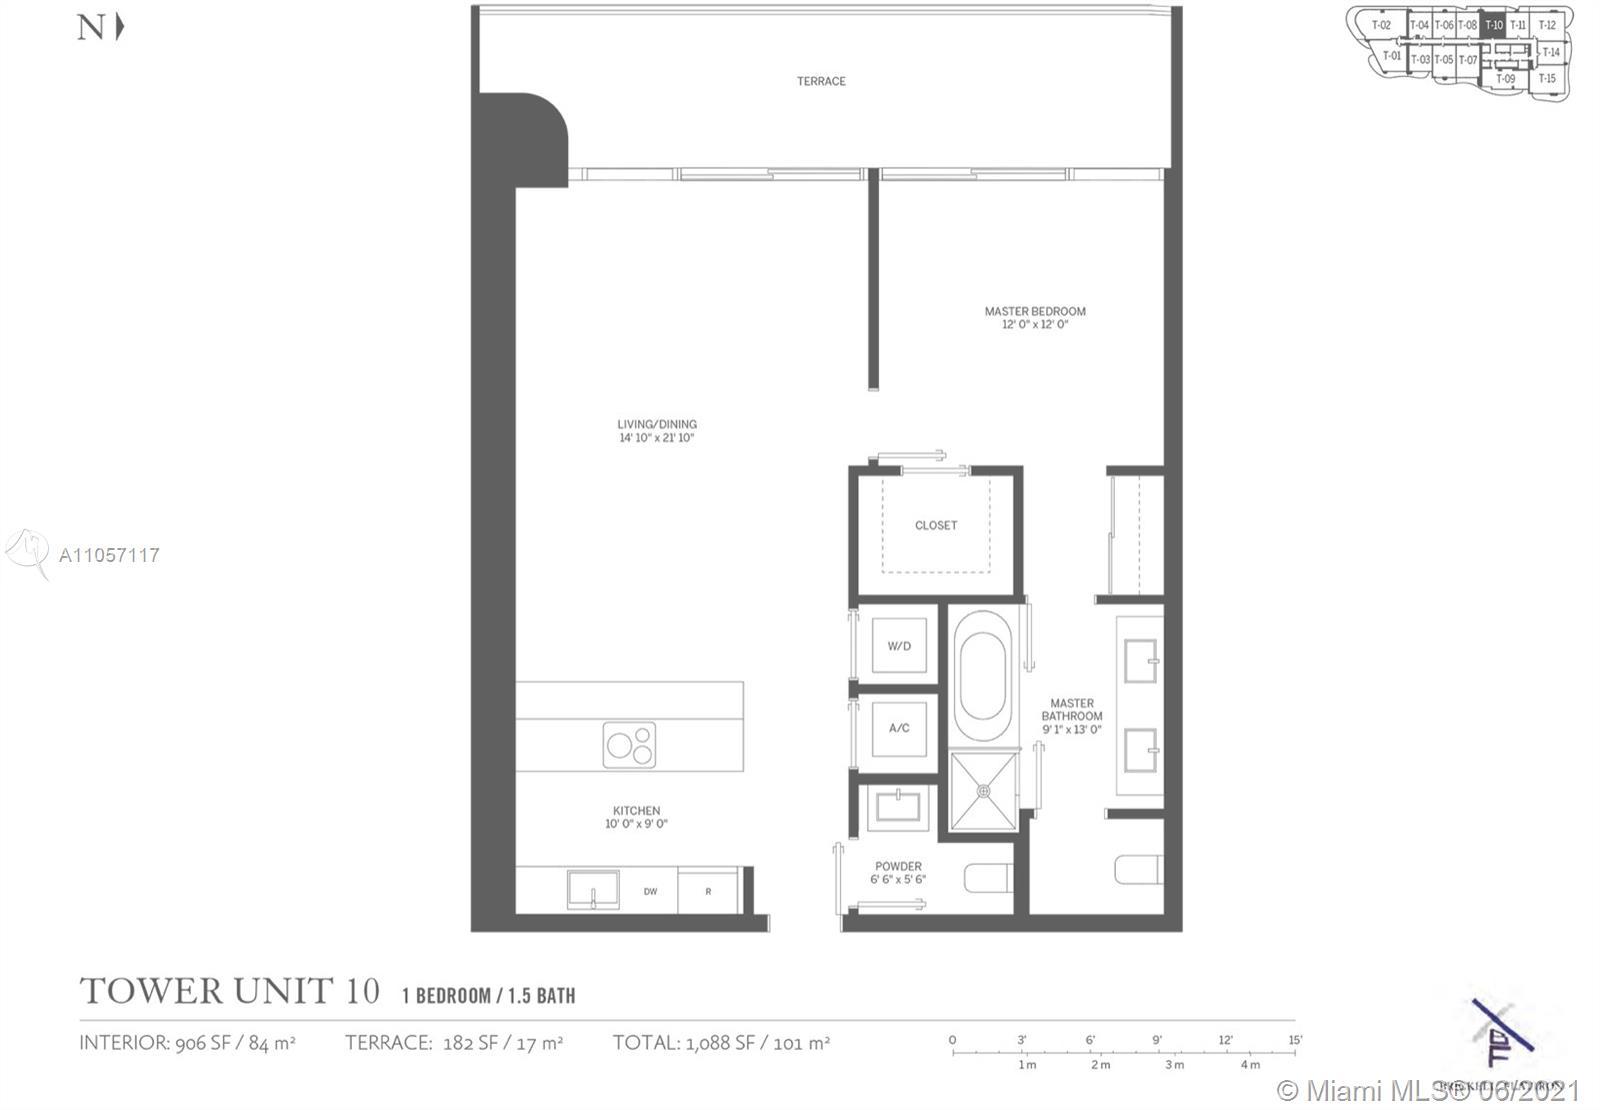 Brickell FlatIron #3610 - 1000 Brickell Plz #3610, Miami, FL 33131